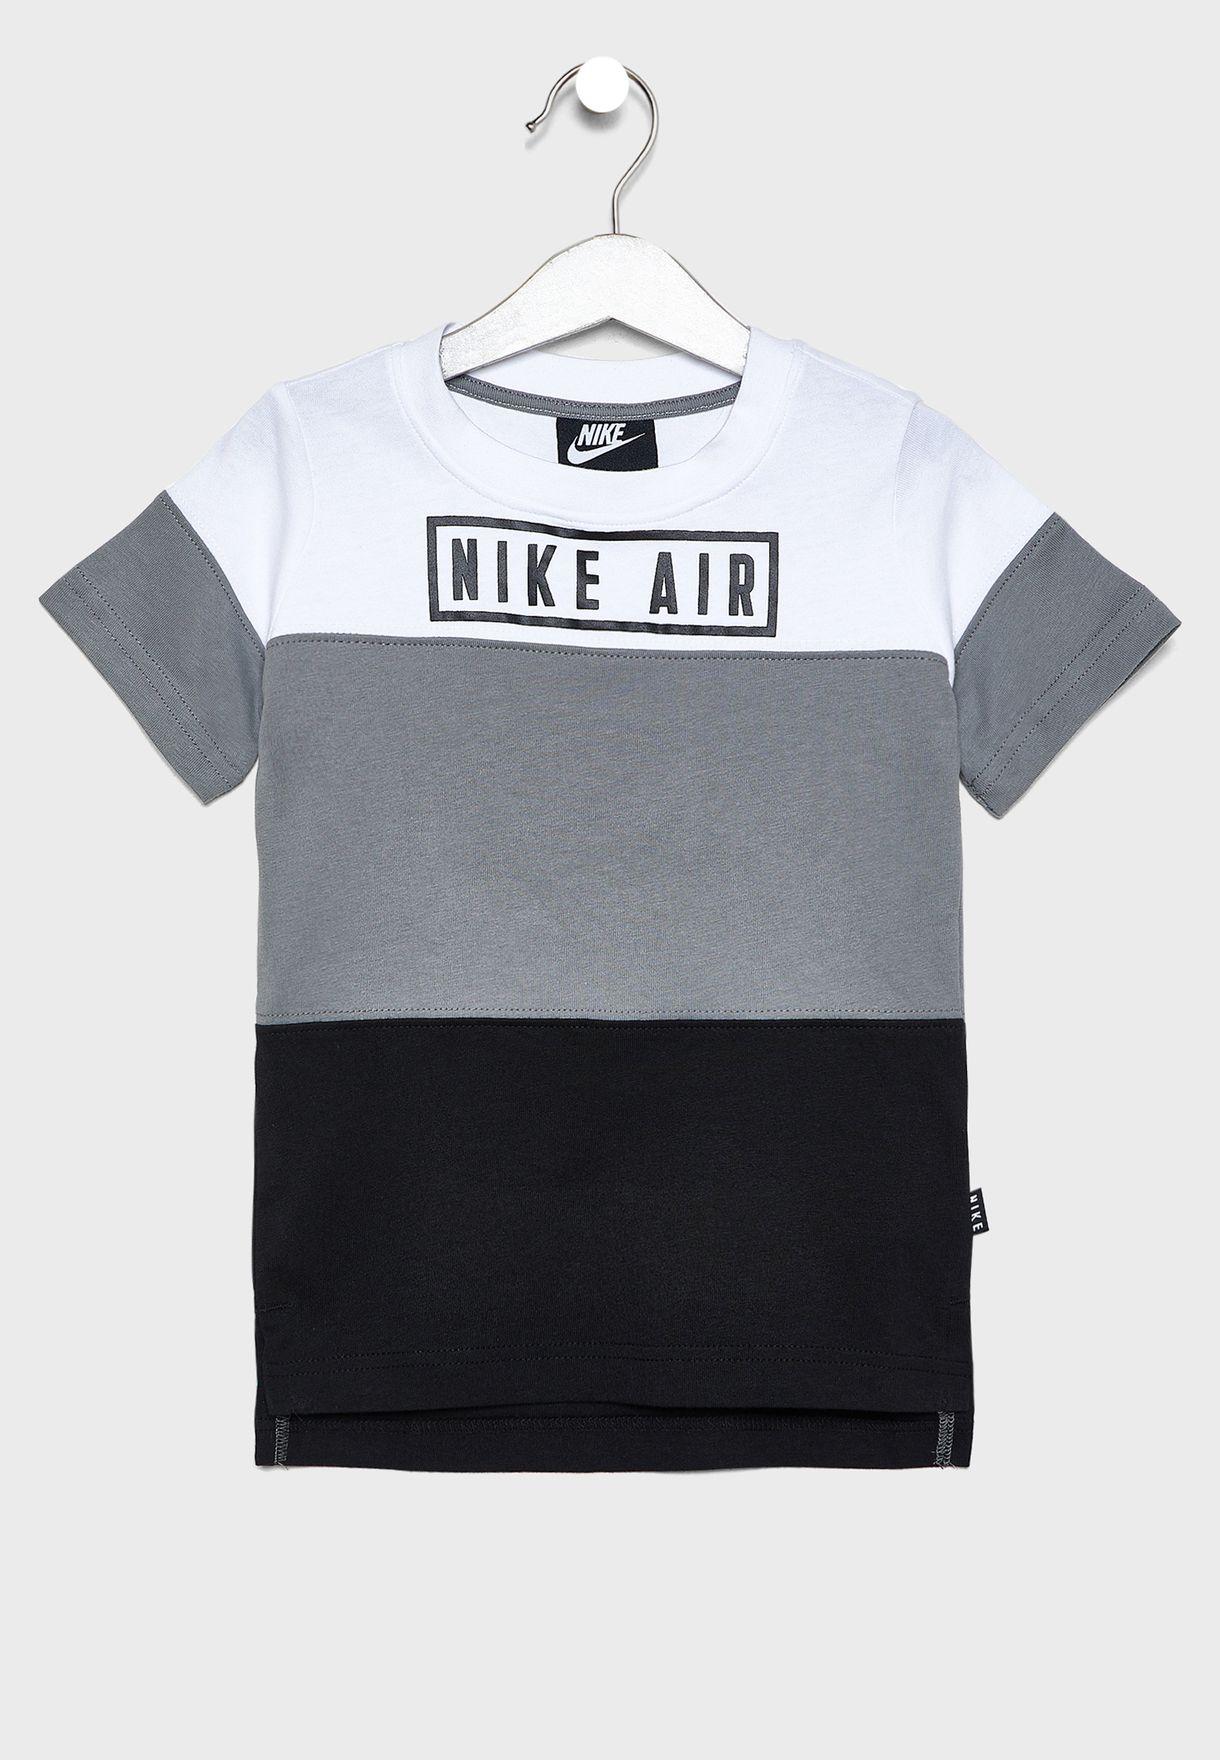 nike air t shirt